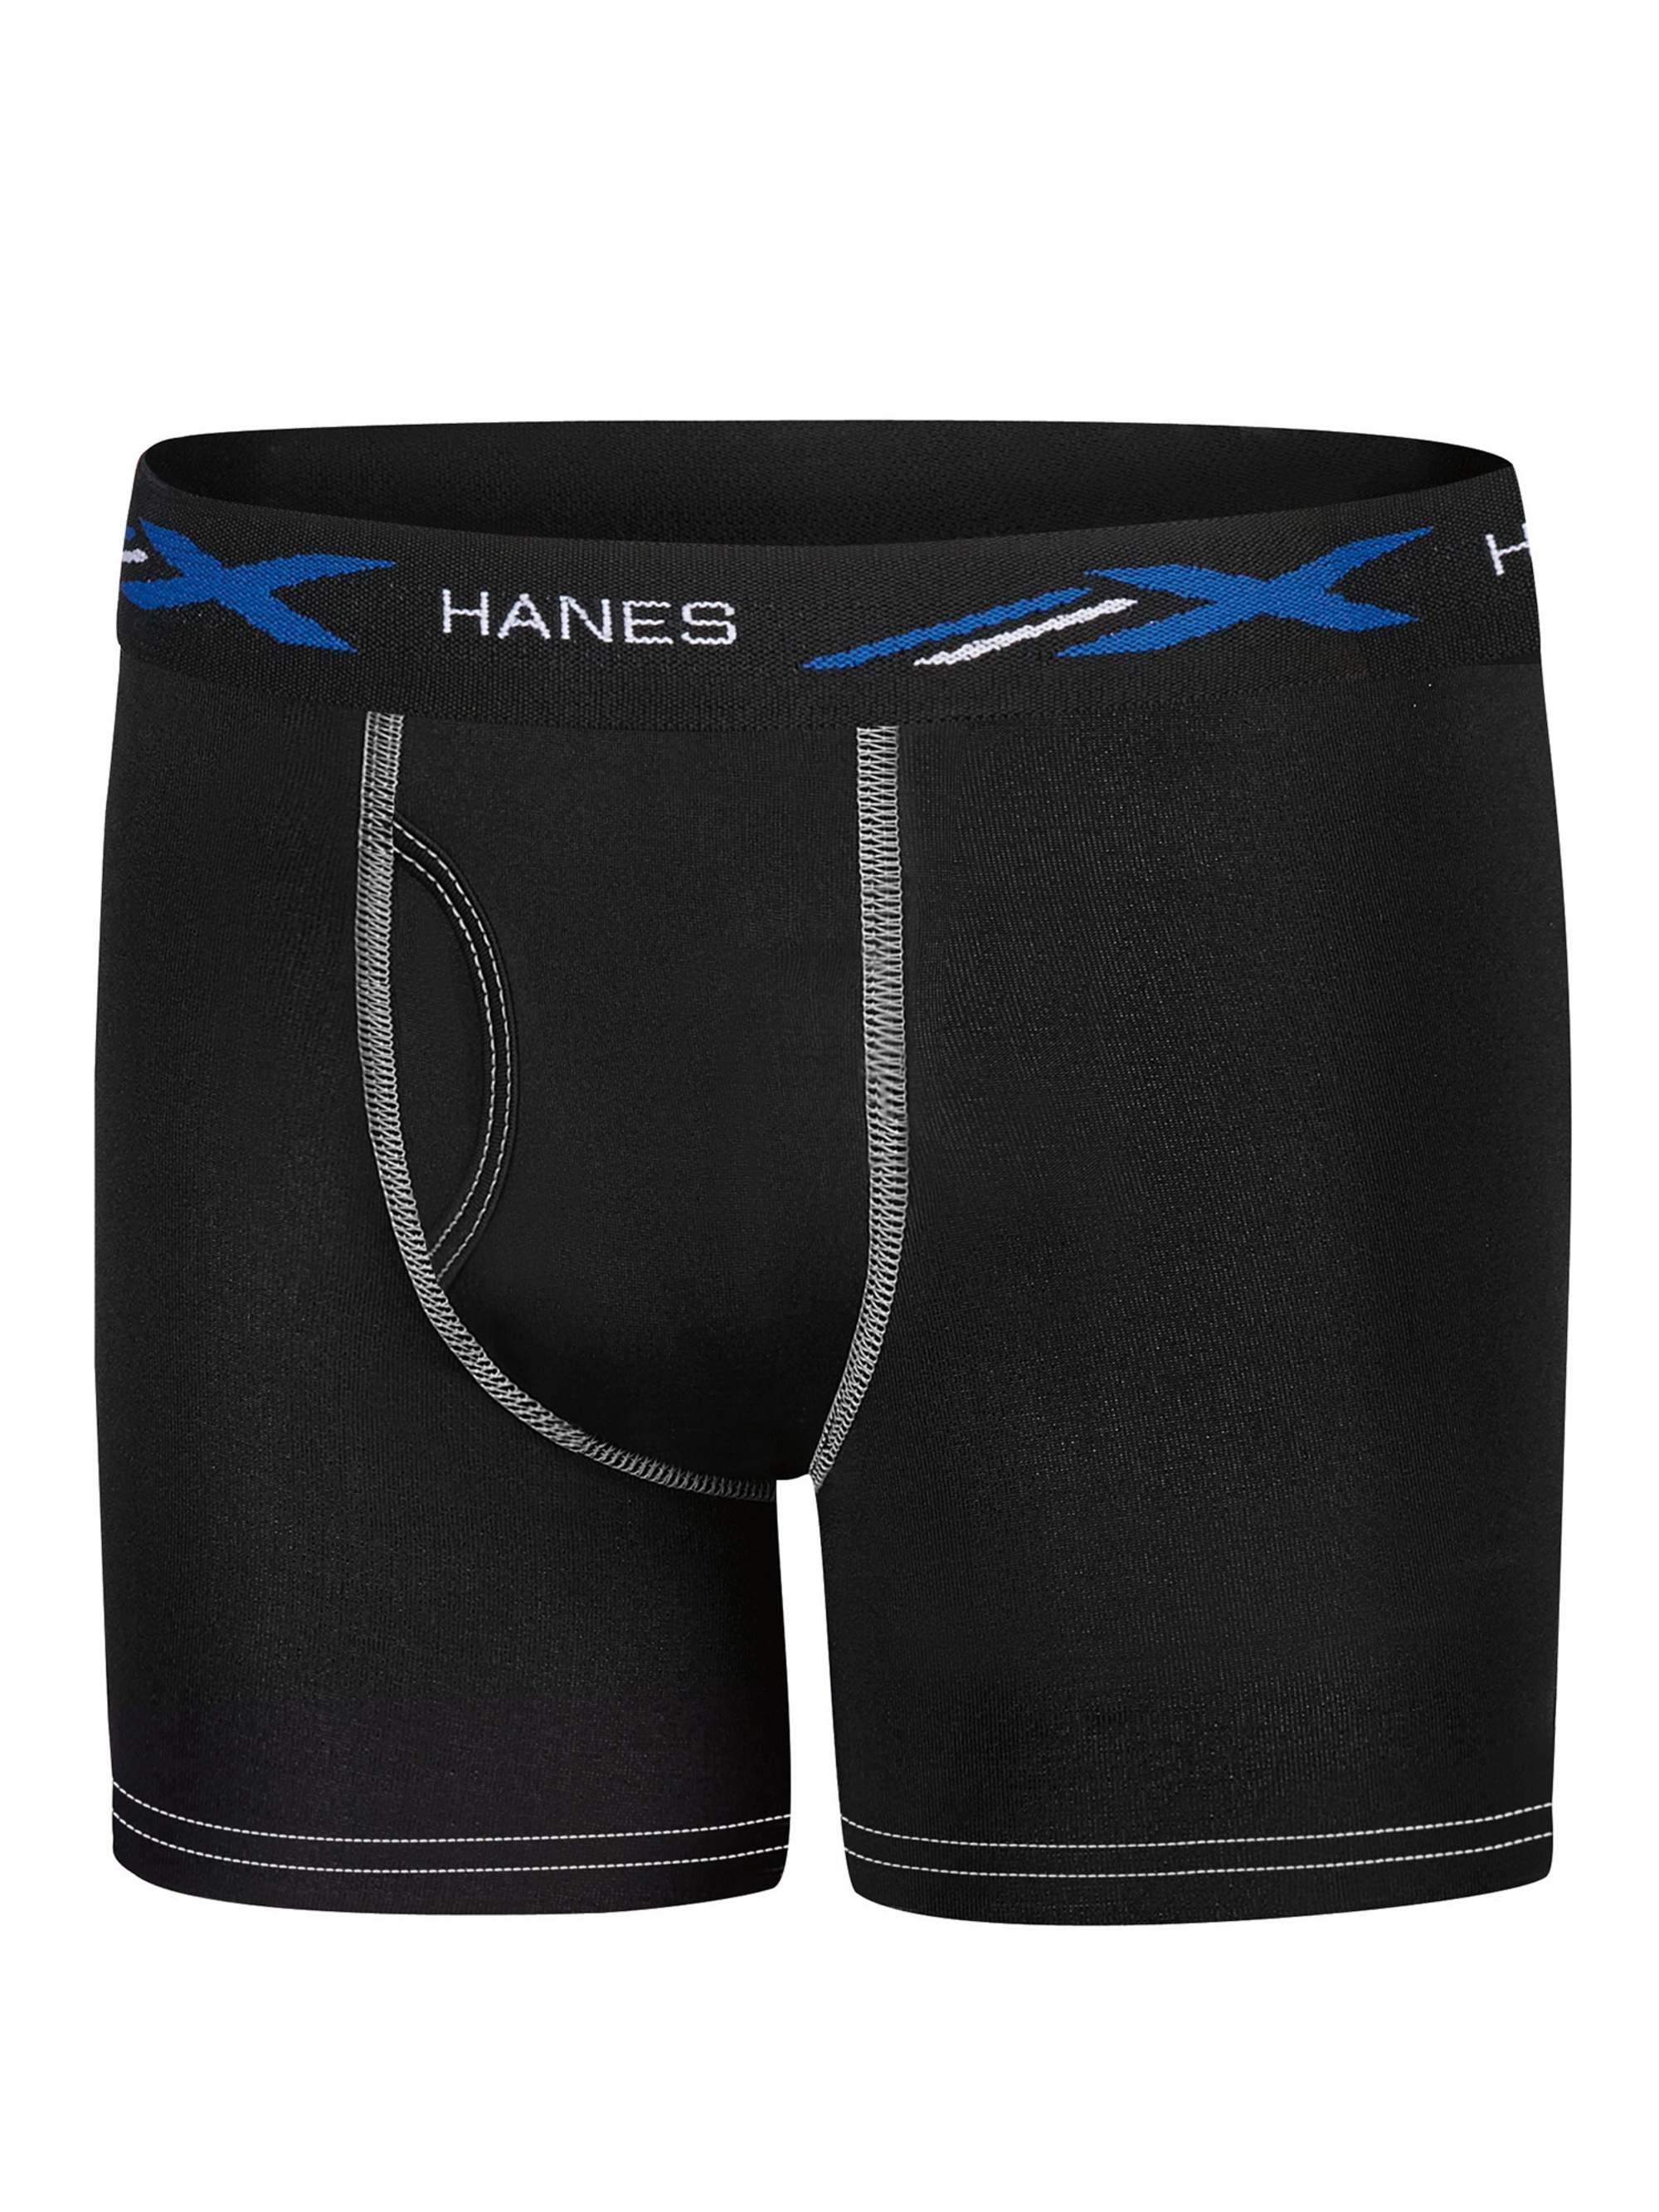 Hanes Boys' X-Temp Active Cool Boxer Brief, 5 Pack